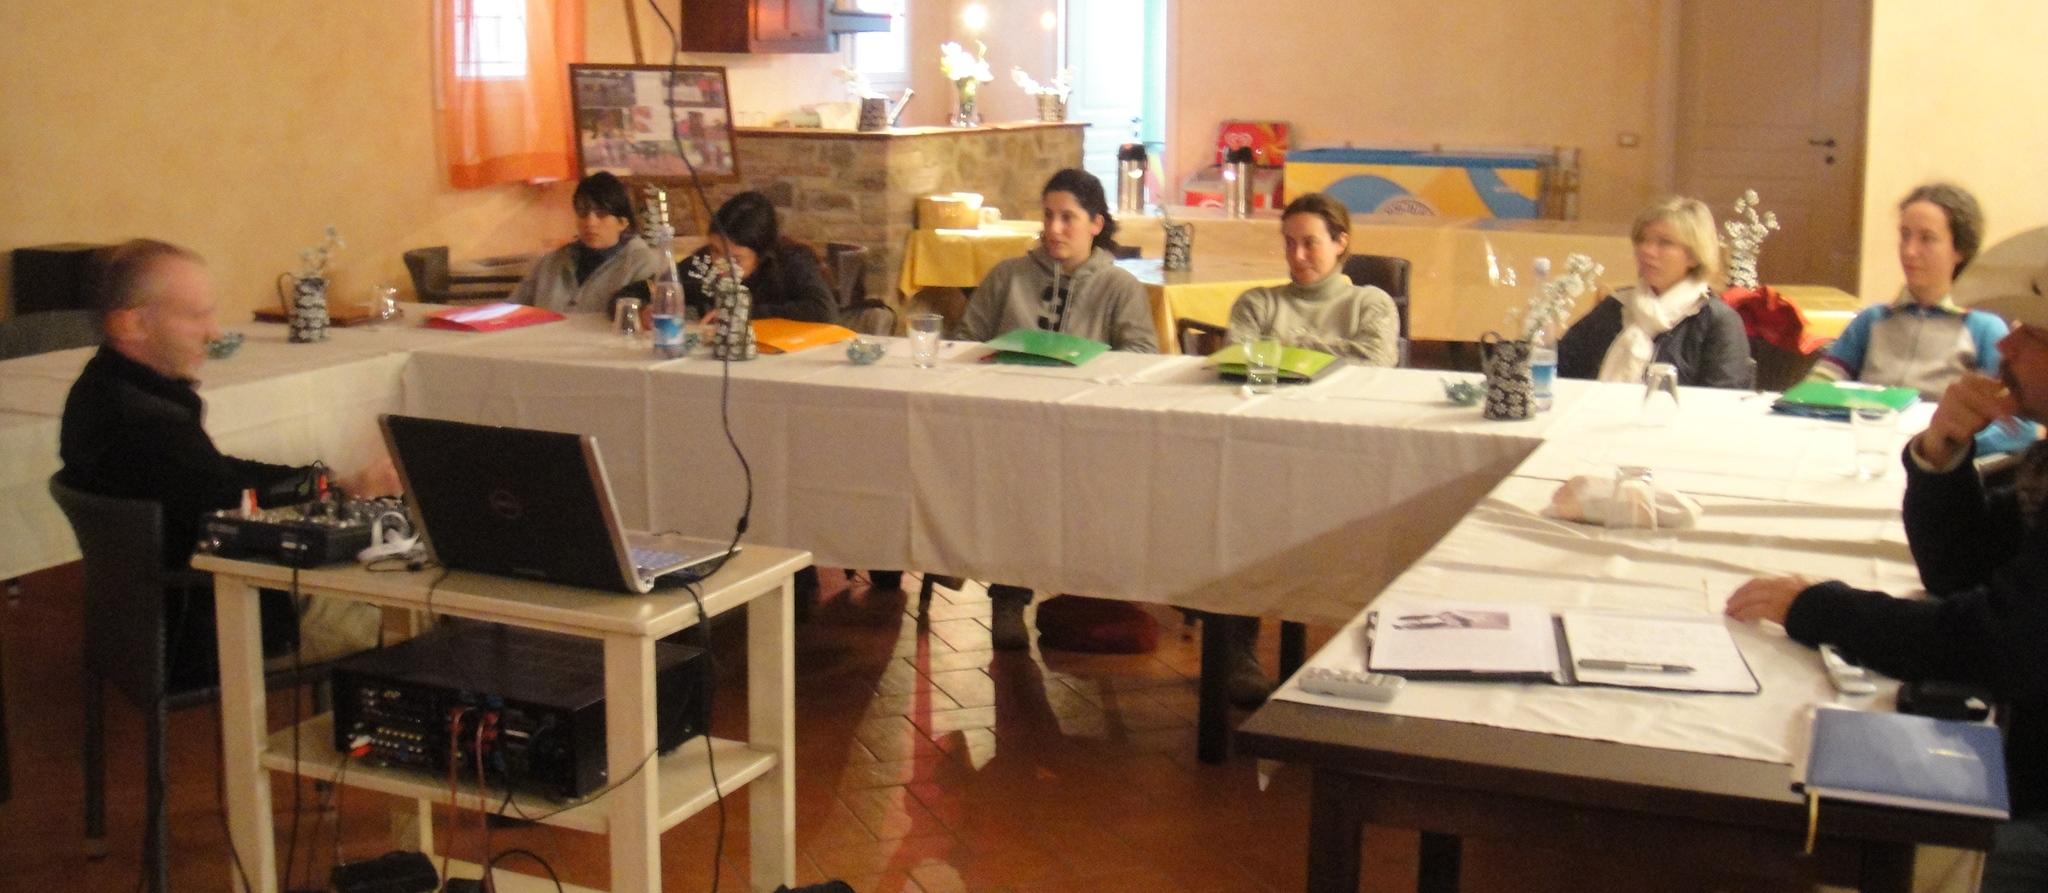 Seminar on Equine applied behavior - 2010 Animantia